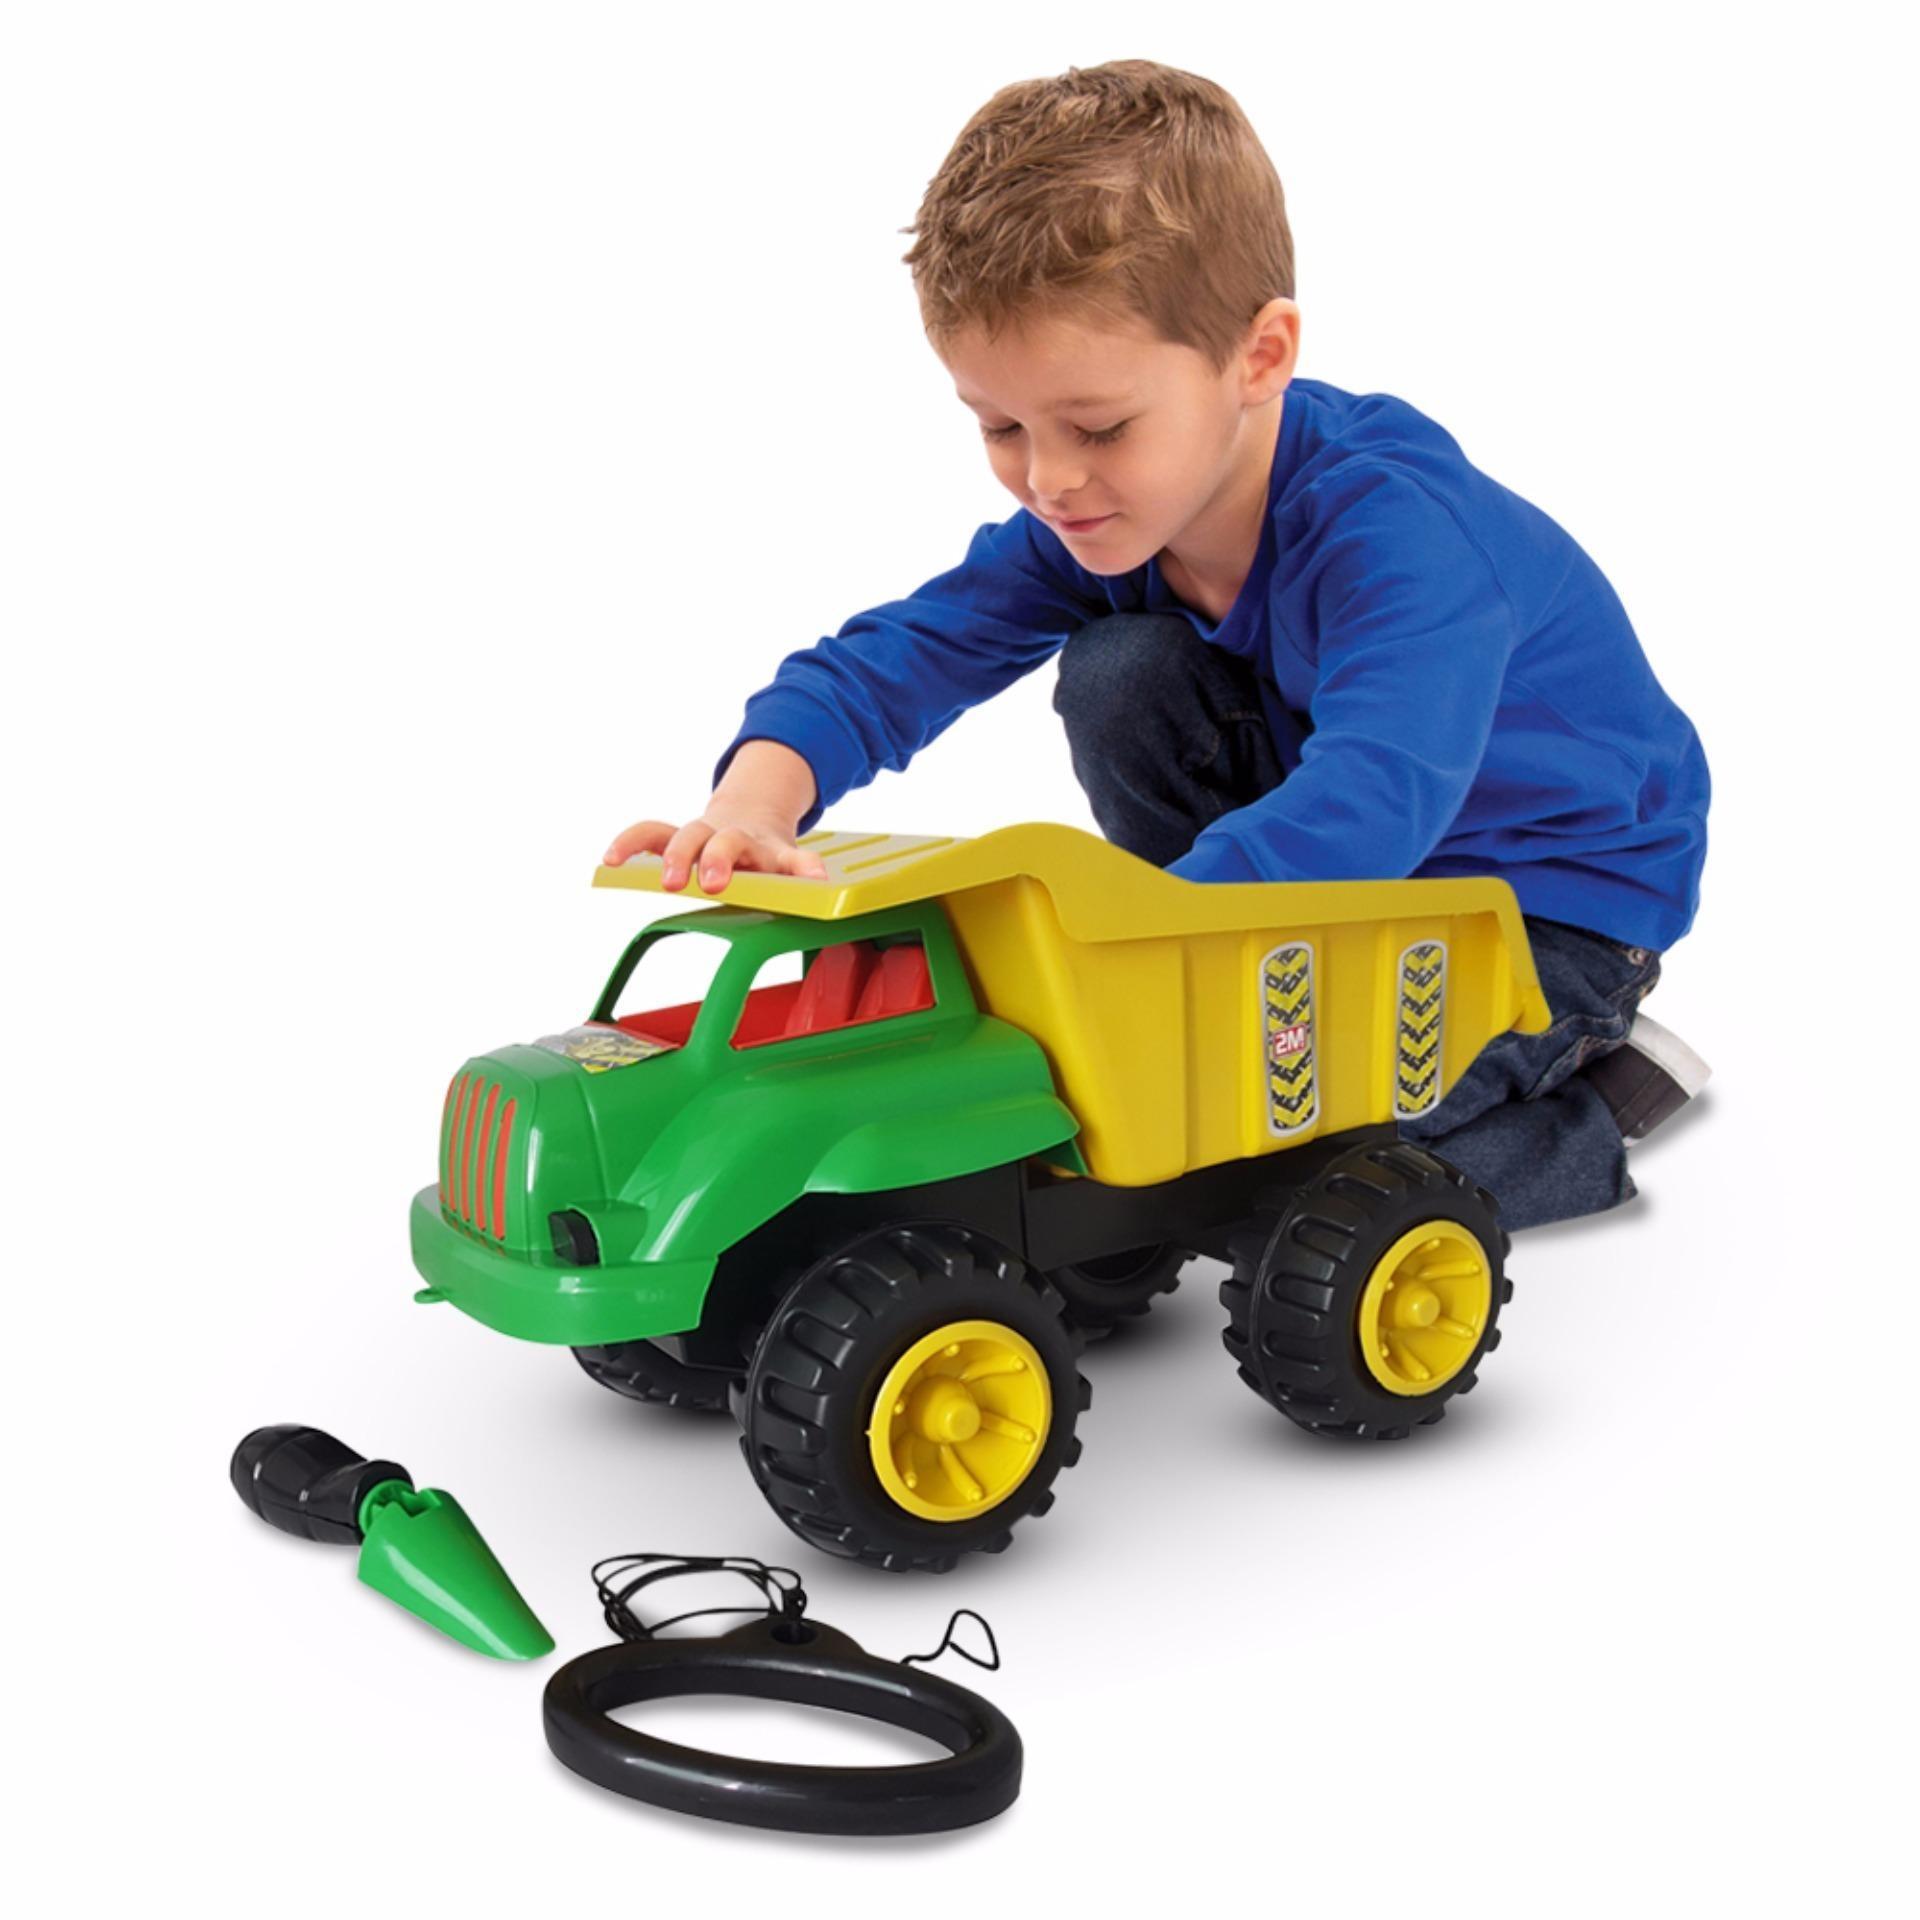 Ocean Toy Yotta Mobil Truck Pasir Crocodile Mainan Anak CRD Multicolor